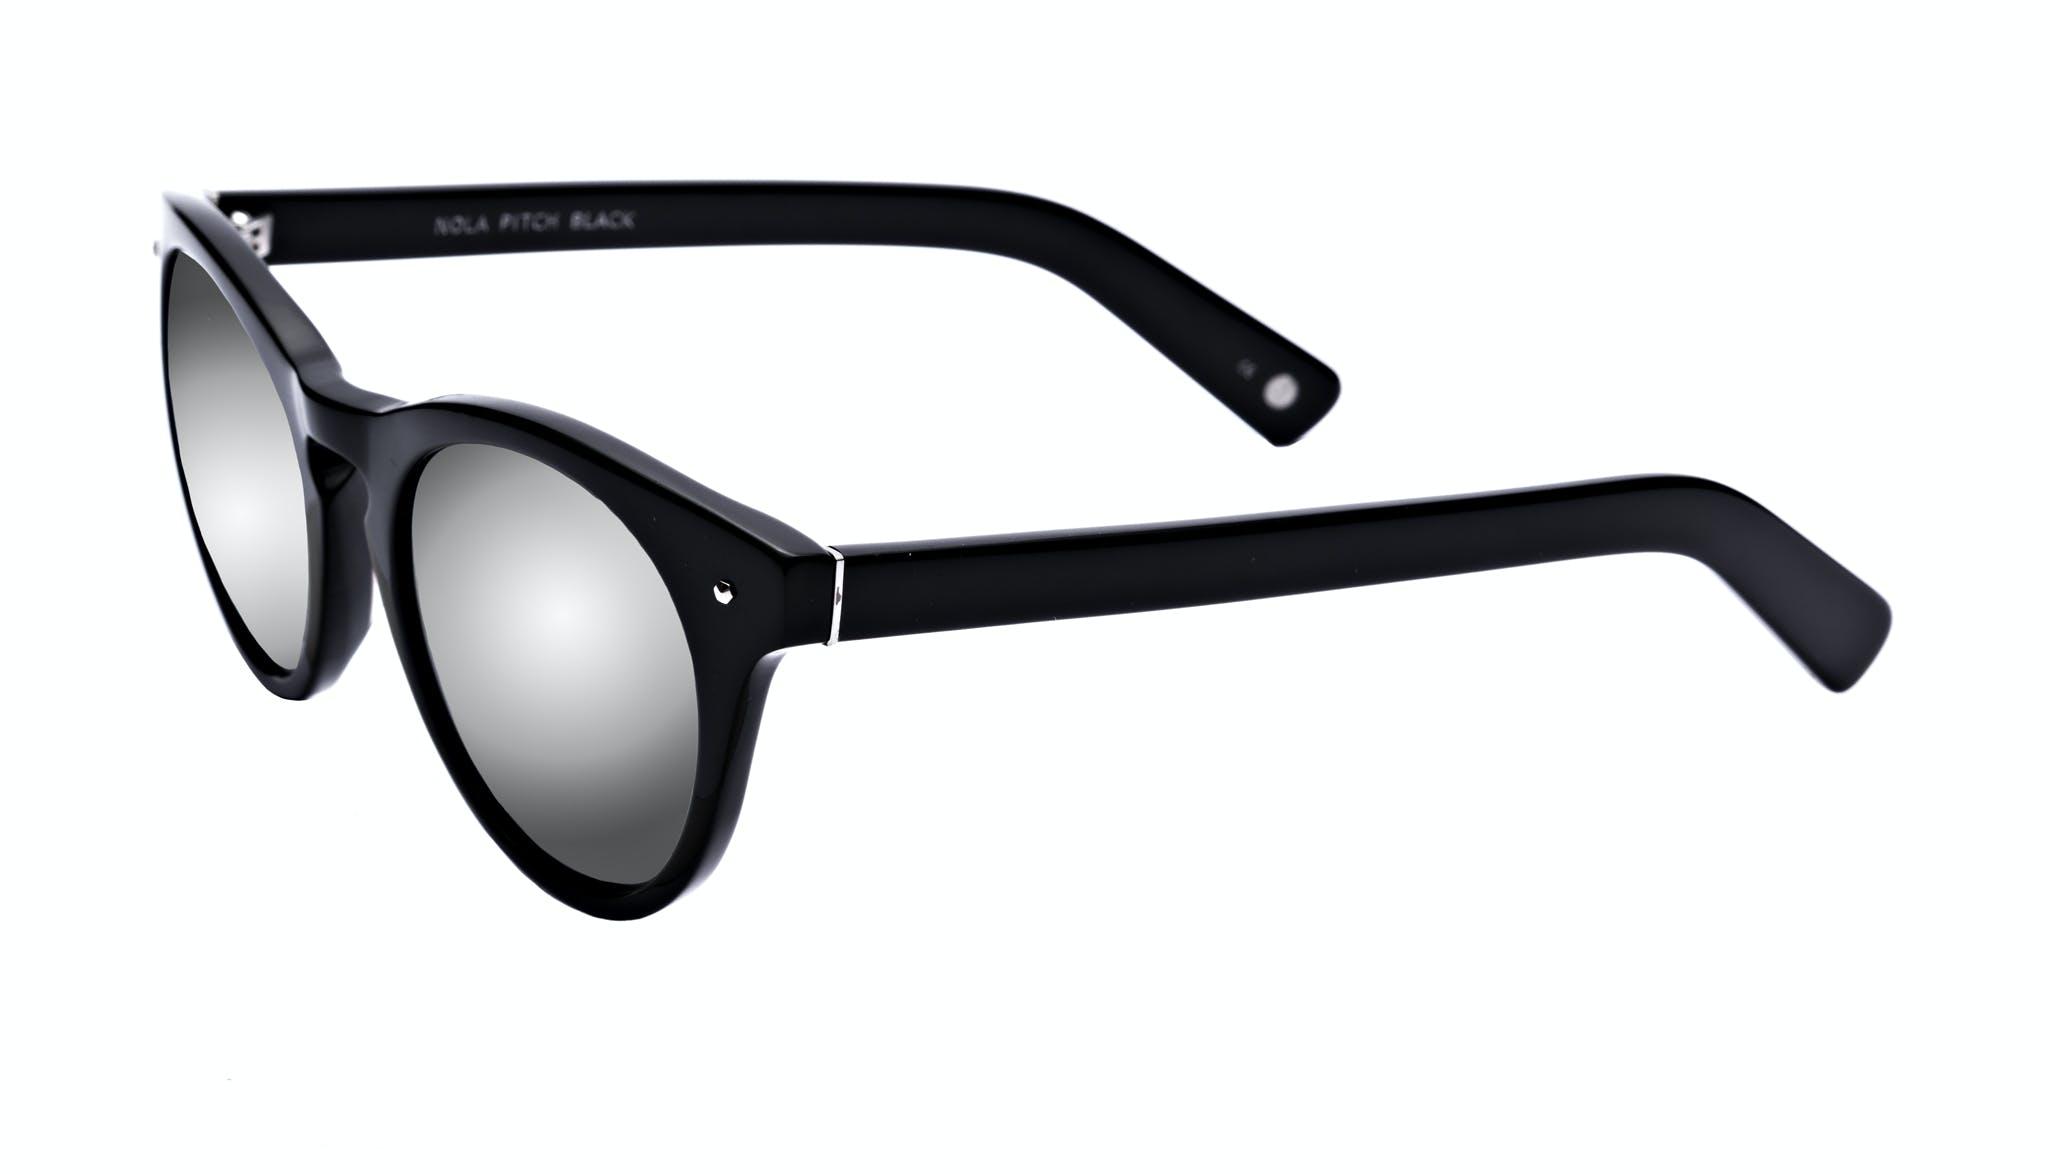 Affordable Fashion Glasses Cat Eye Round Sunglasses Women Nola Pitch Black Tilt